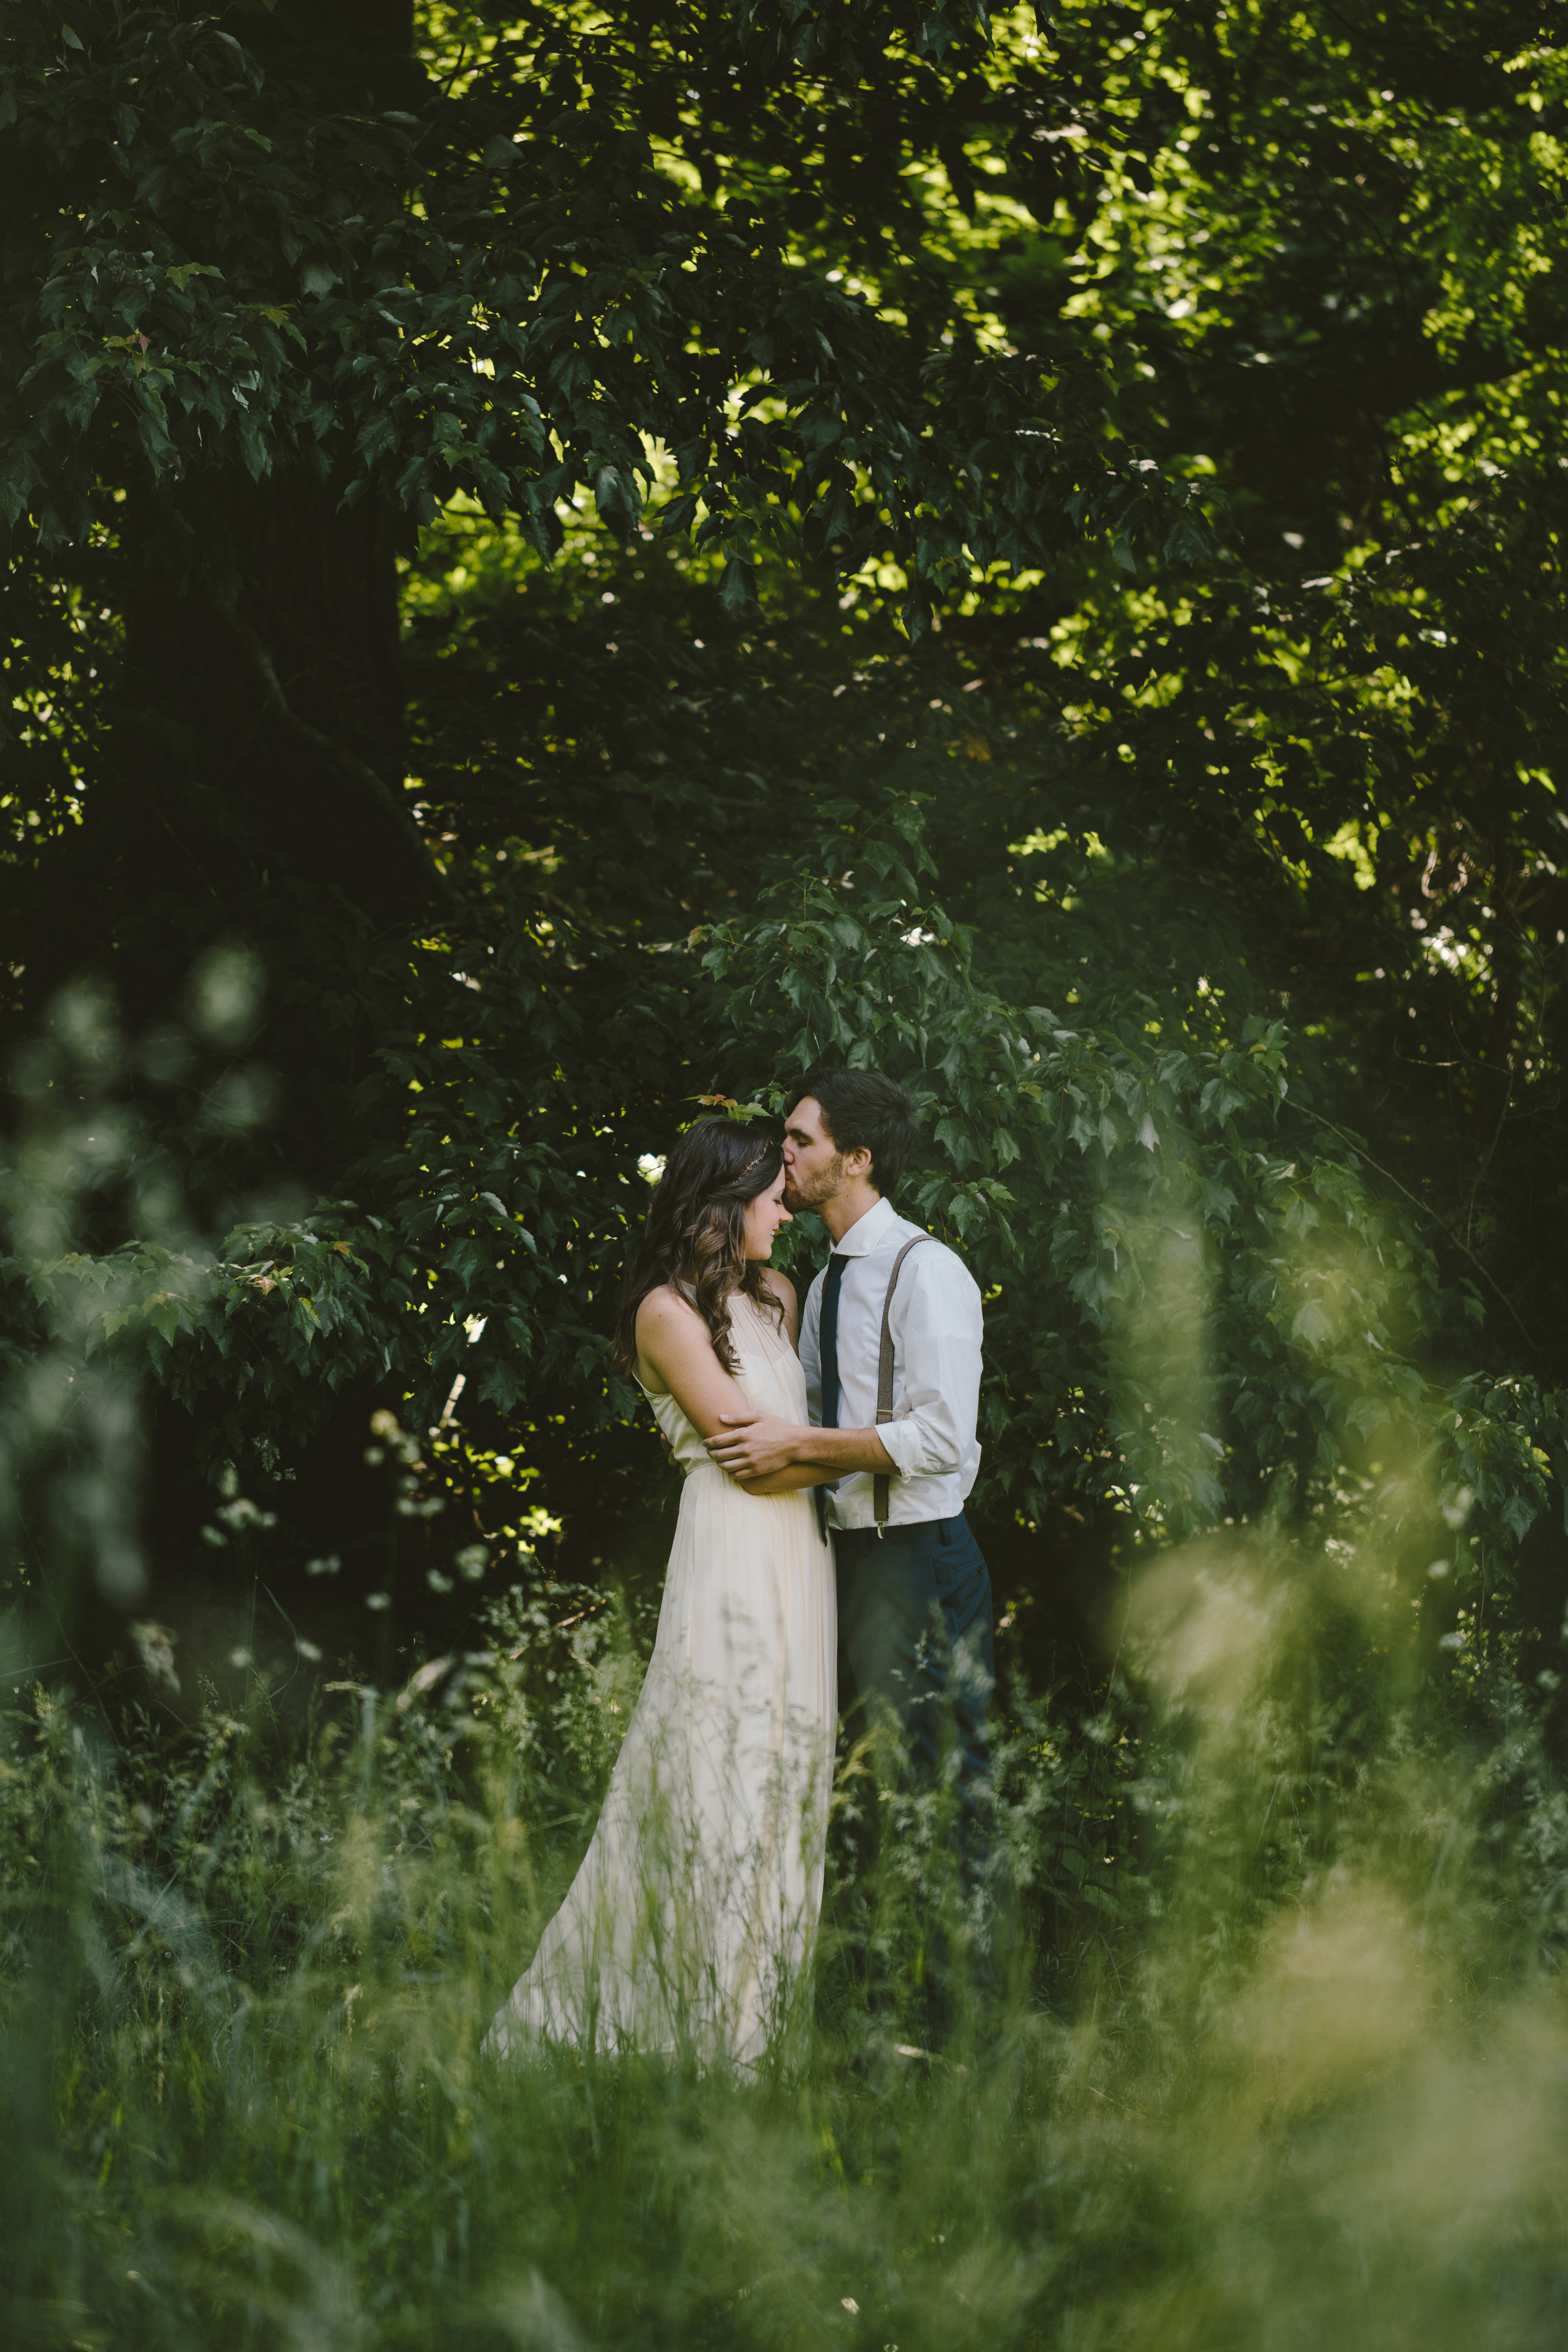 Zack + Hannah Millsaps Wedding in Greenville SC Nashville Wedding Photographer Photography Anthology-10.jpg